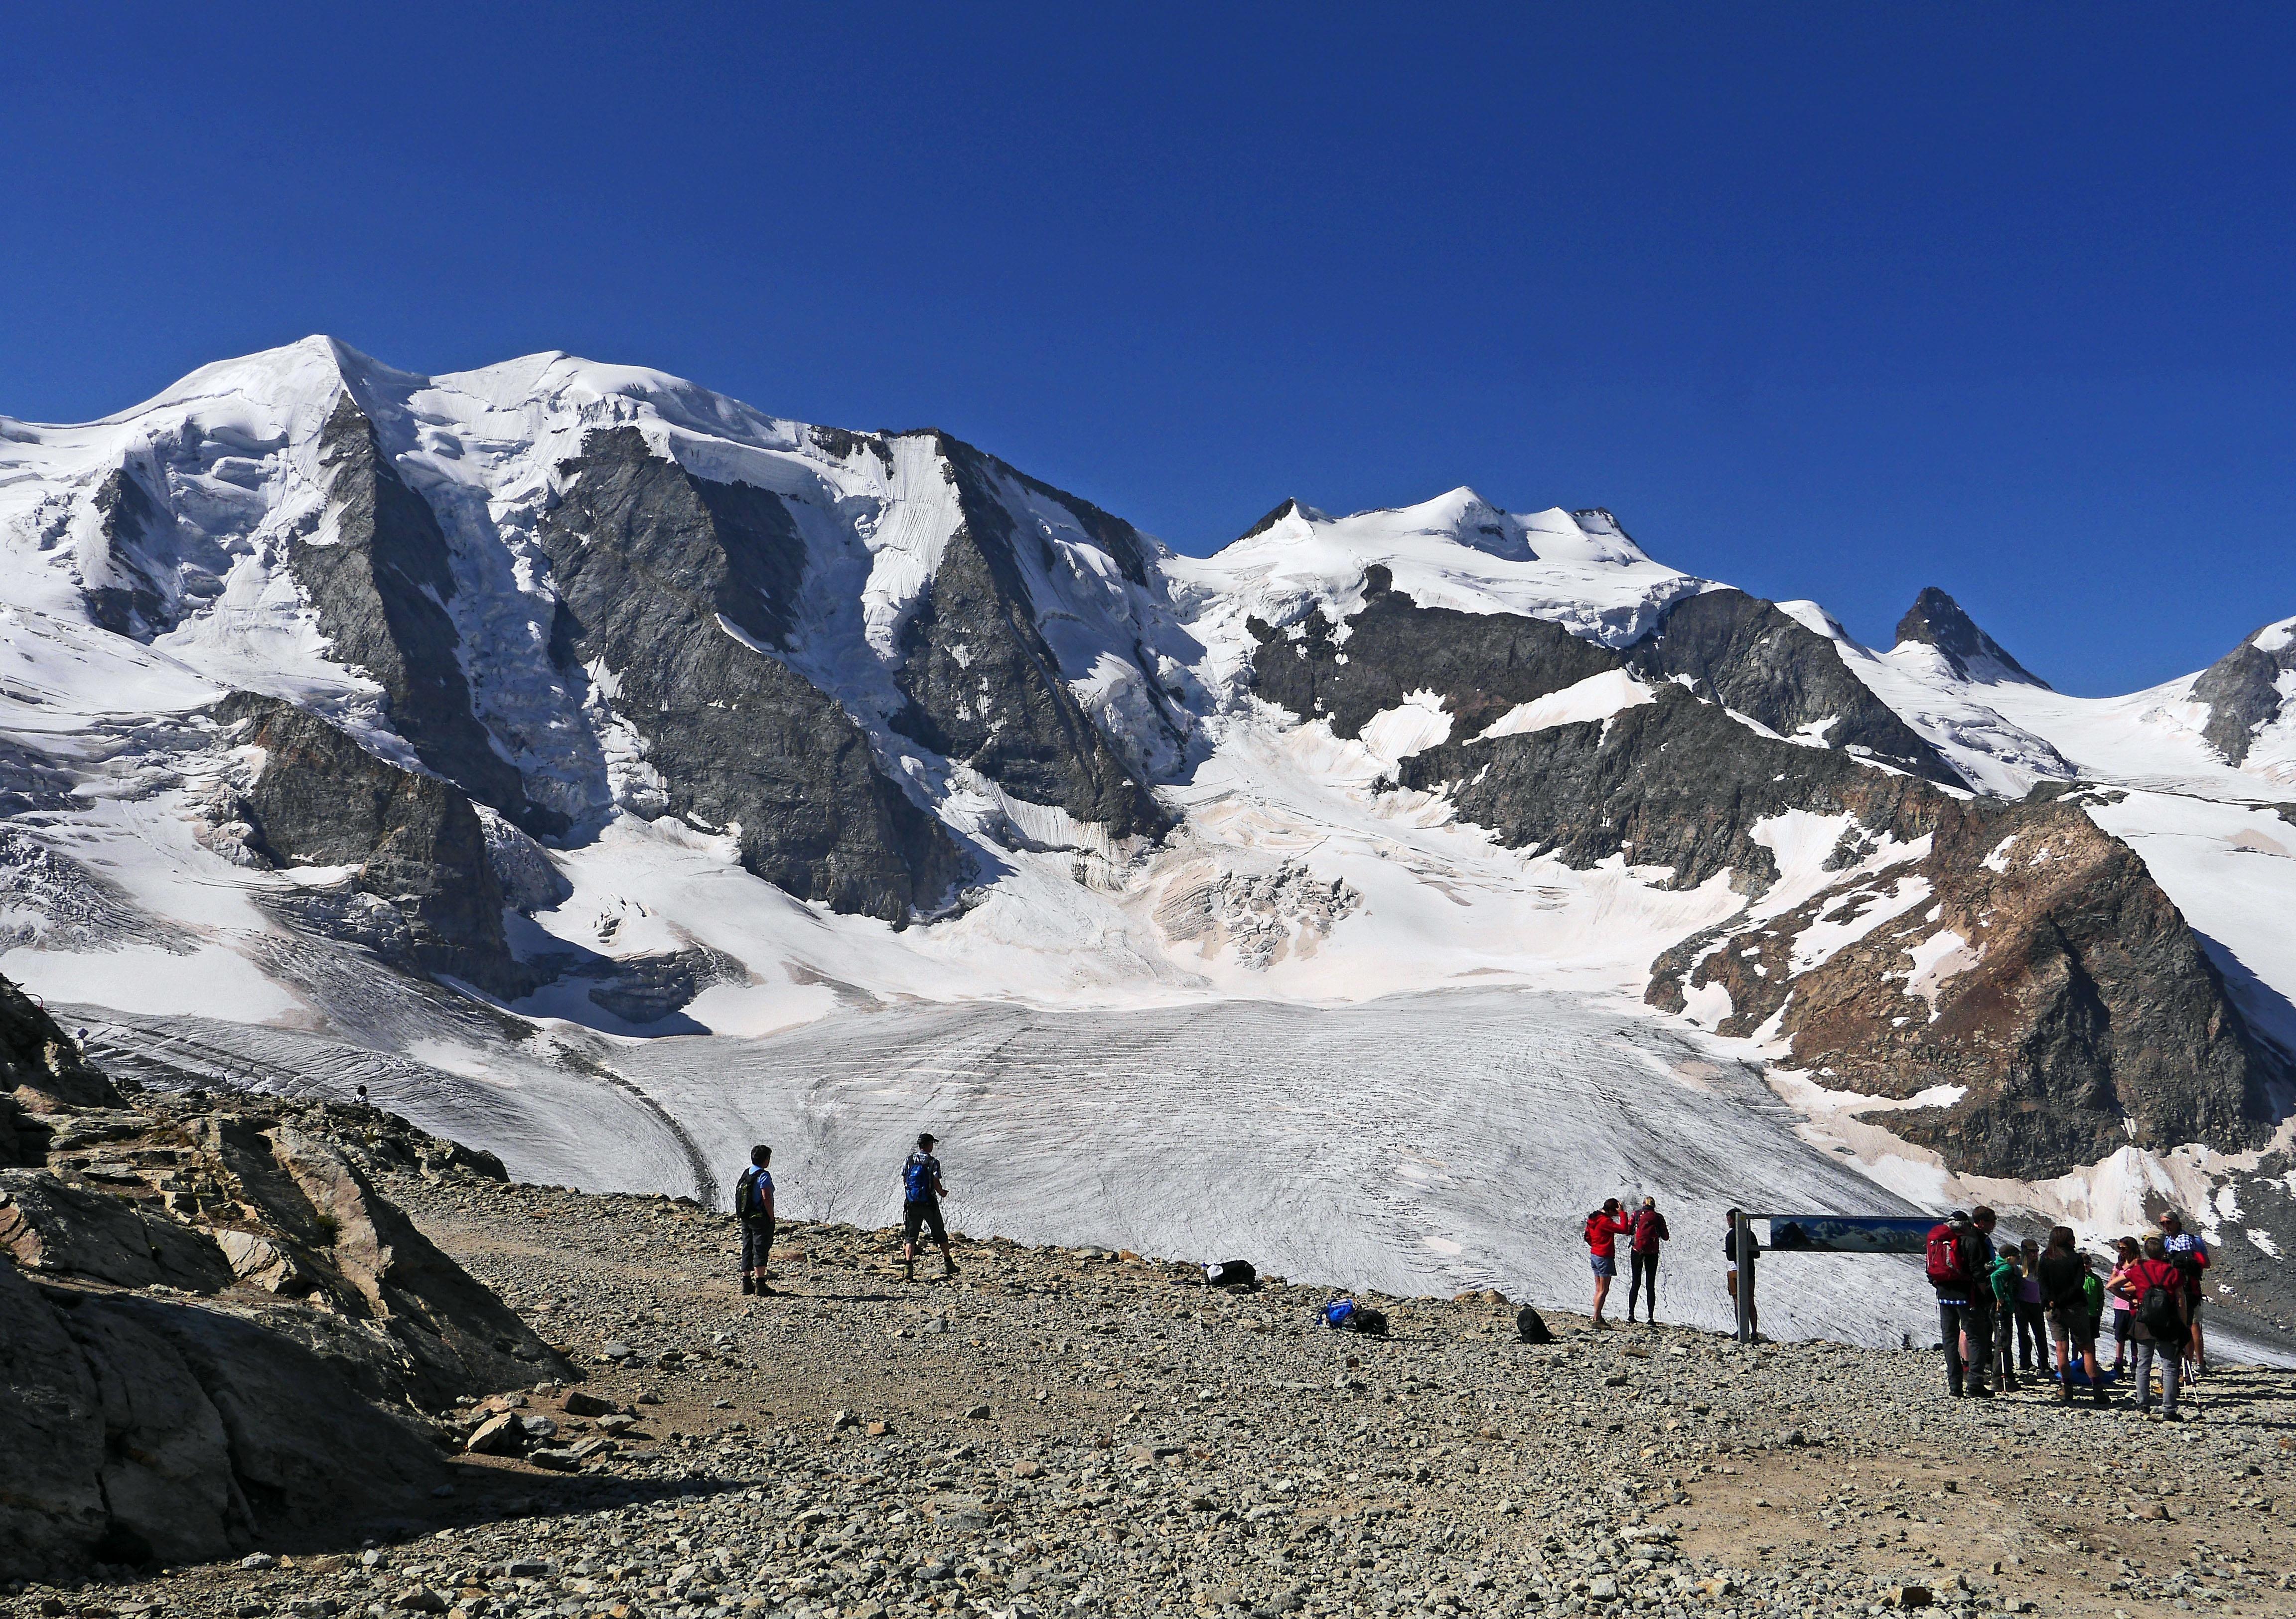 Piz Bernina, Moteratsch Glacier, Engadine, Switzerland  № 1473549  скачать